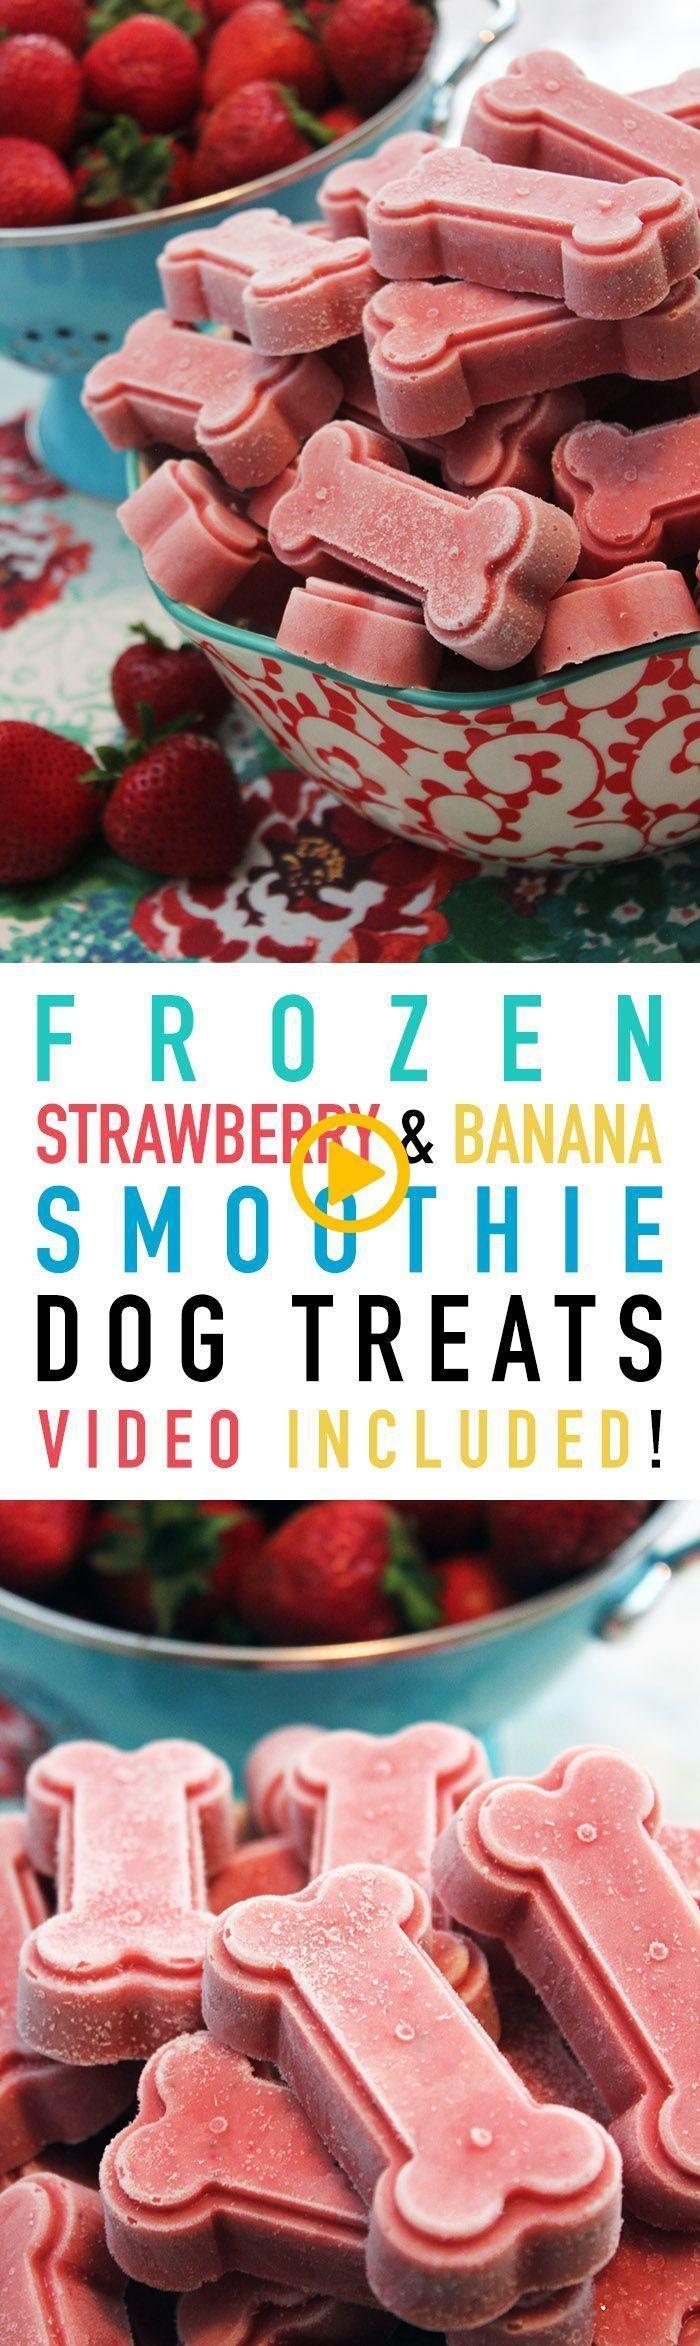 Strawberry Banana Smoothie Frozen Dog Treats | The Cottage Market #strawberrybananasmoothie Strawberry Banana Smoothie Frozen Dog Treats | The Cottage Market #strawberrybananasmoothie